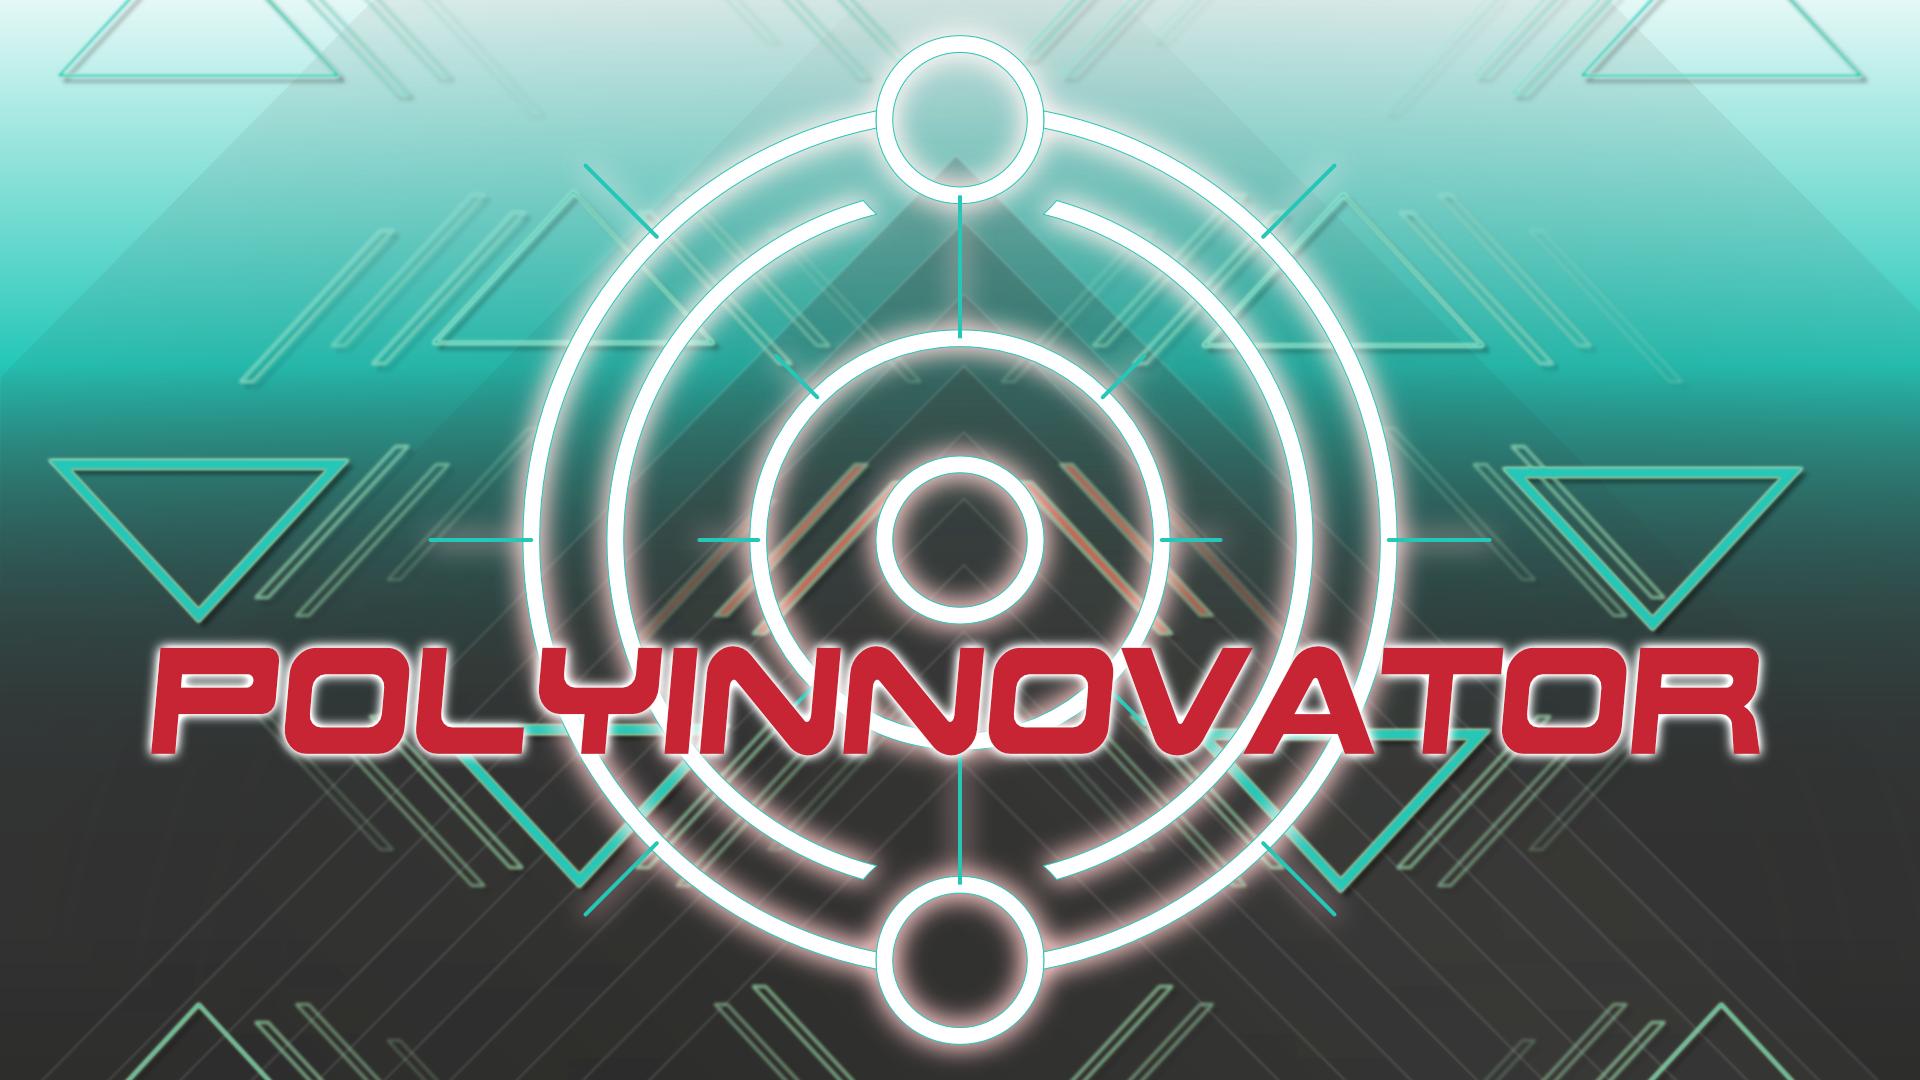 2021 New PolyInnovator Artwork